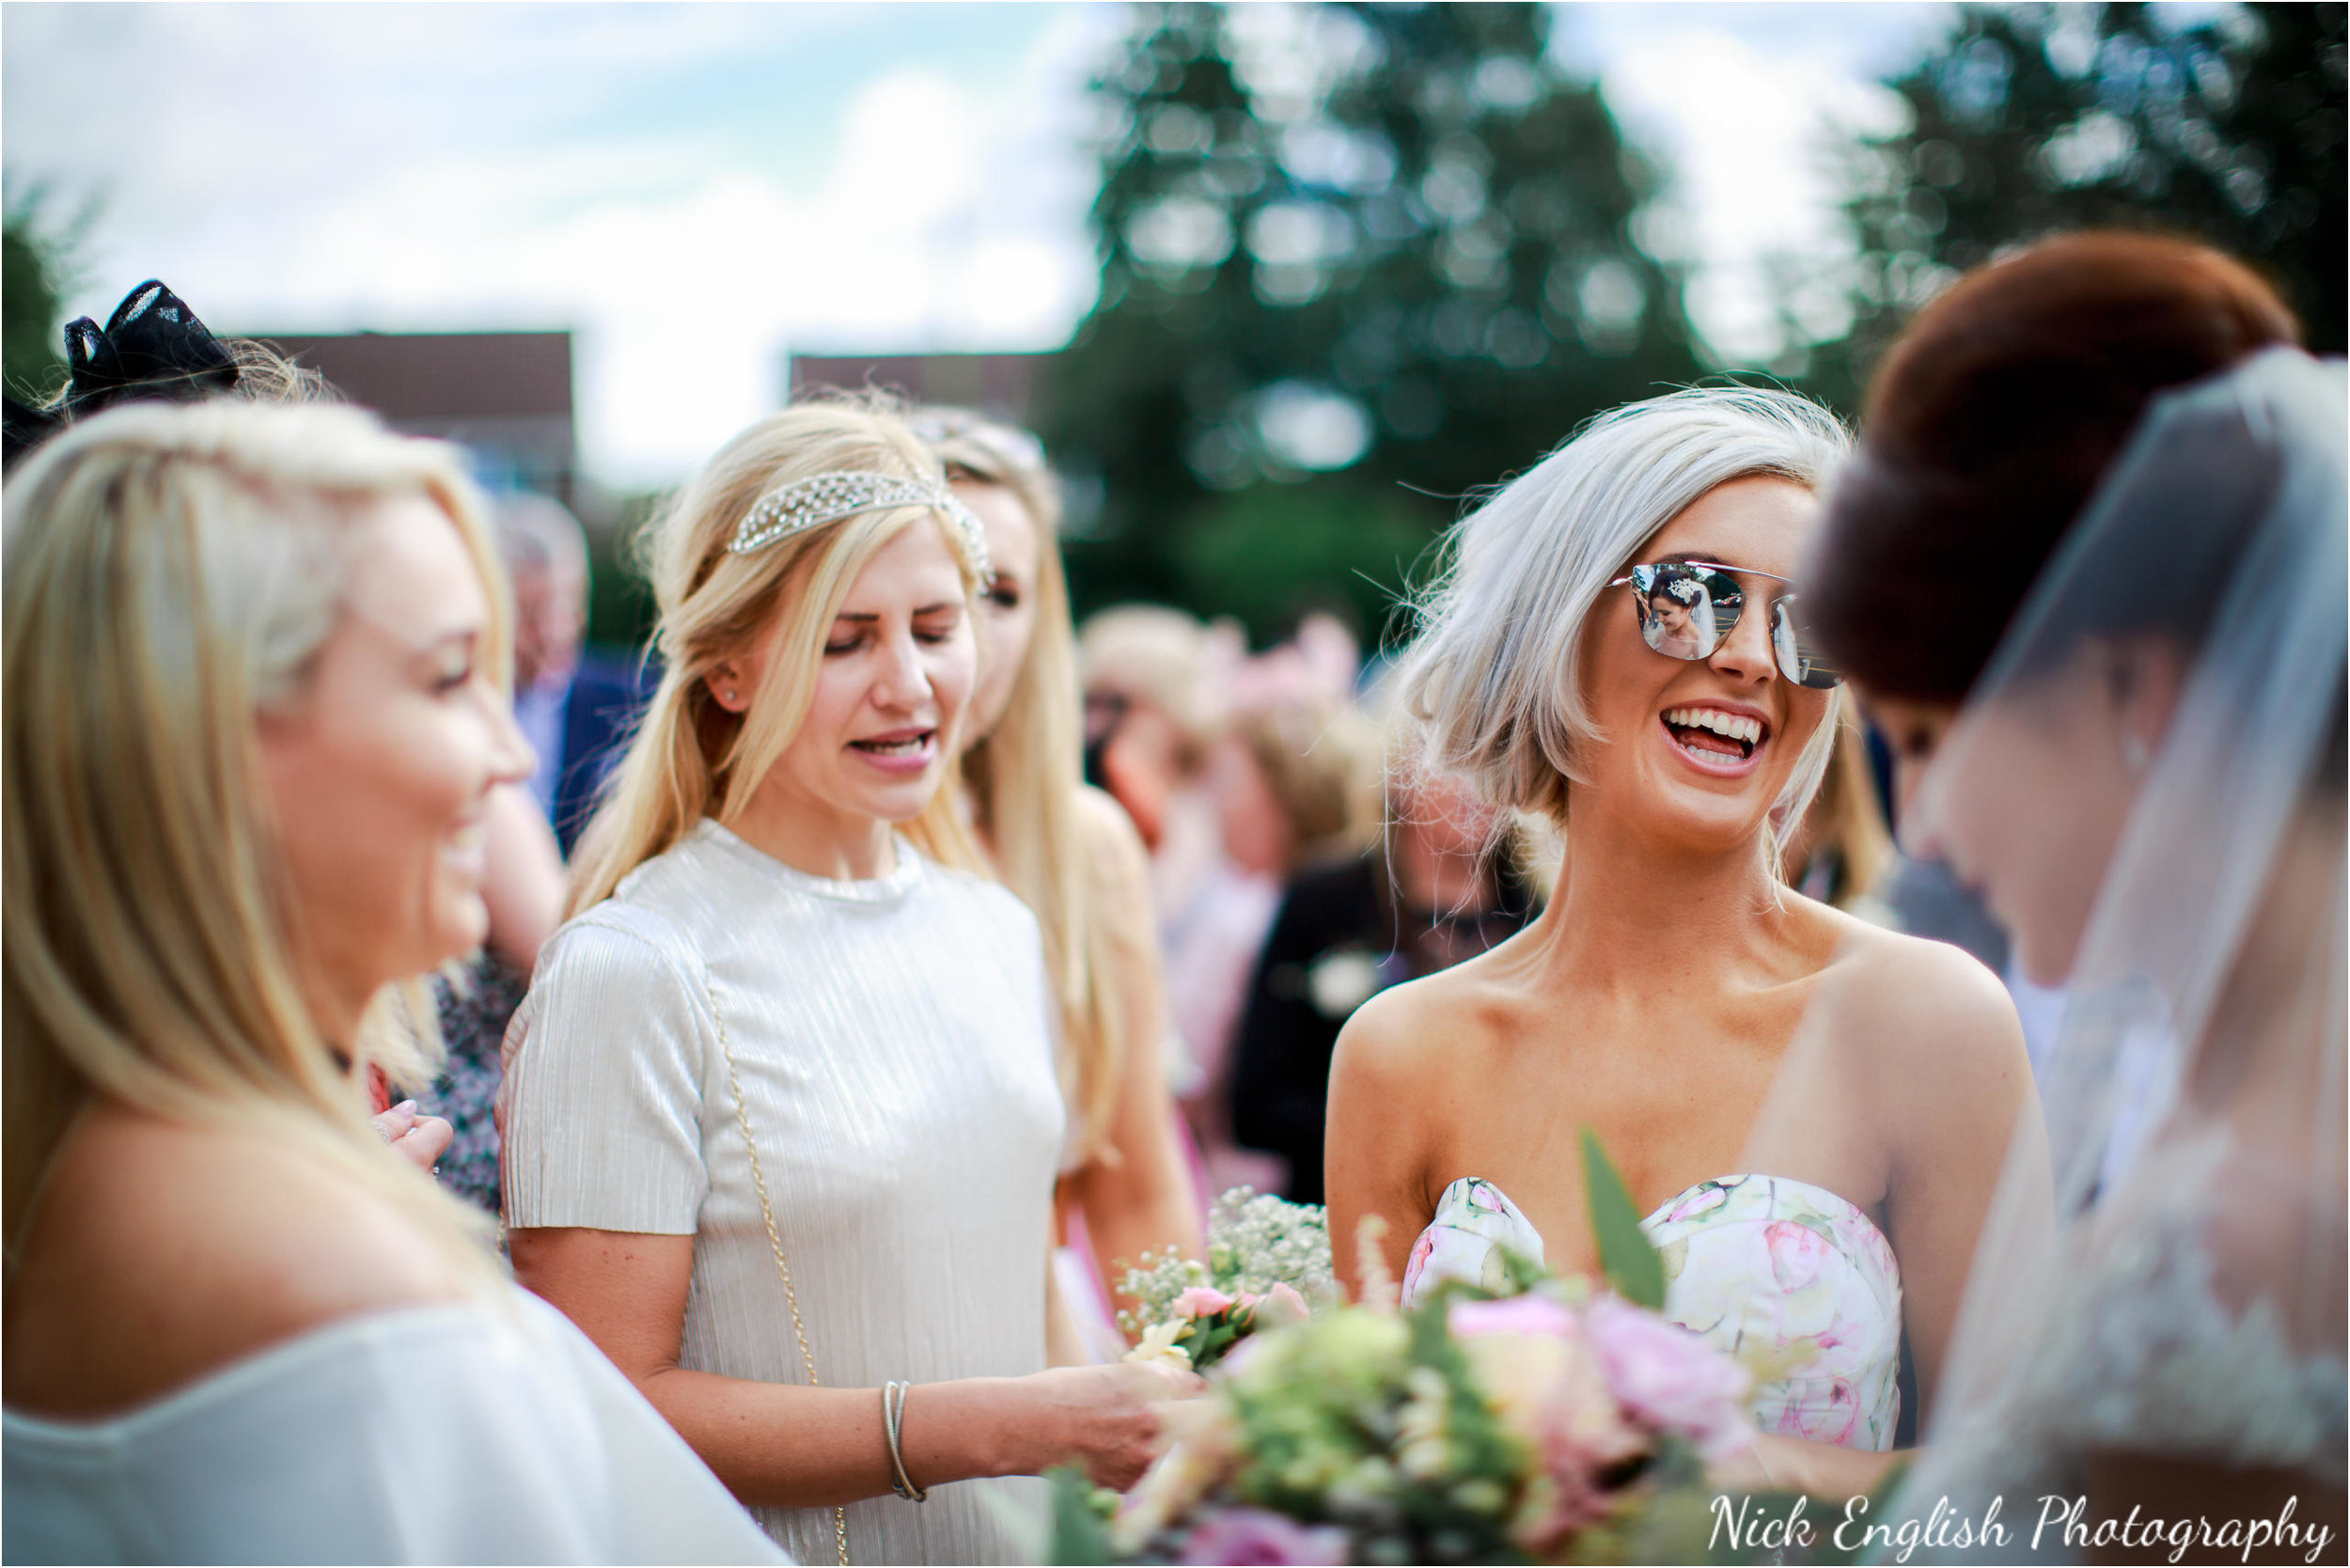 Stacey-Ash-Wedding-Photographs-Stanley-House-Preston-Lancashire-96.jpg